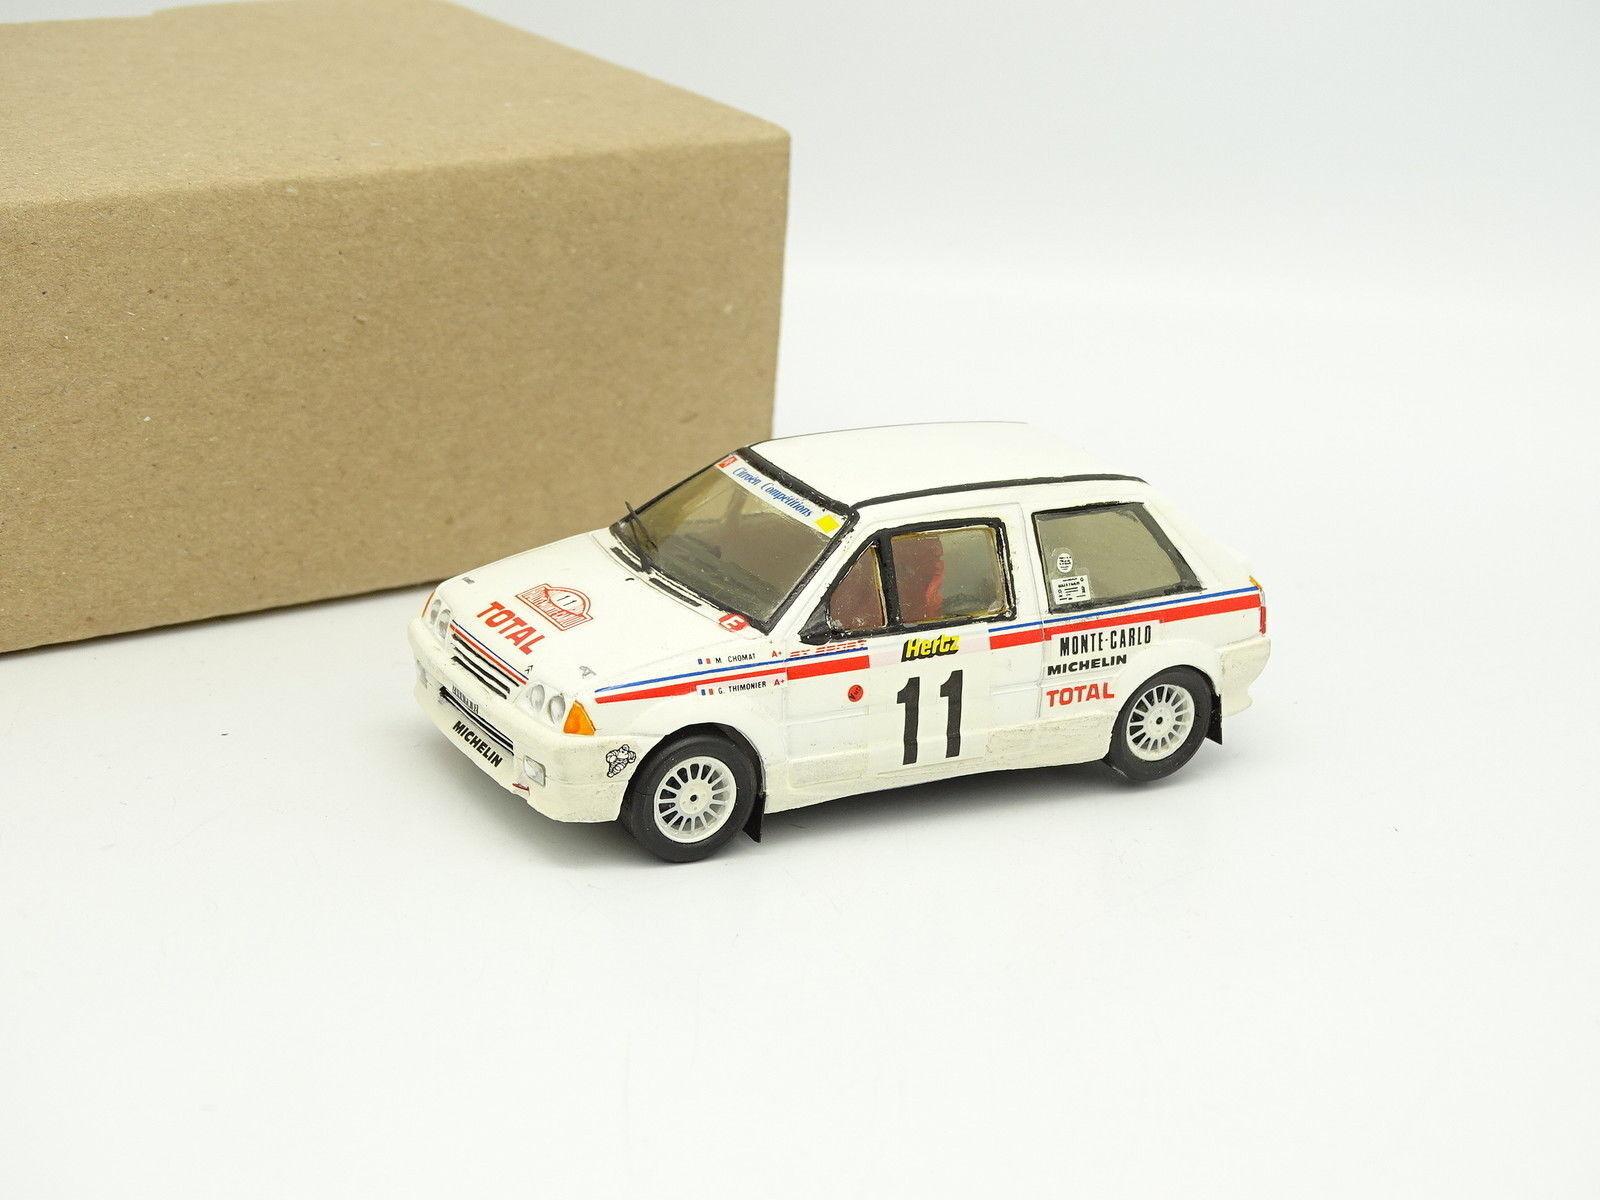 Provence moulage kit assembled 1 43 - citroen ax sport rallye monte carlo 1988   11